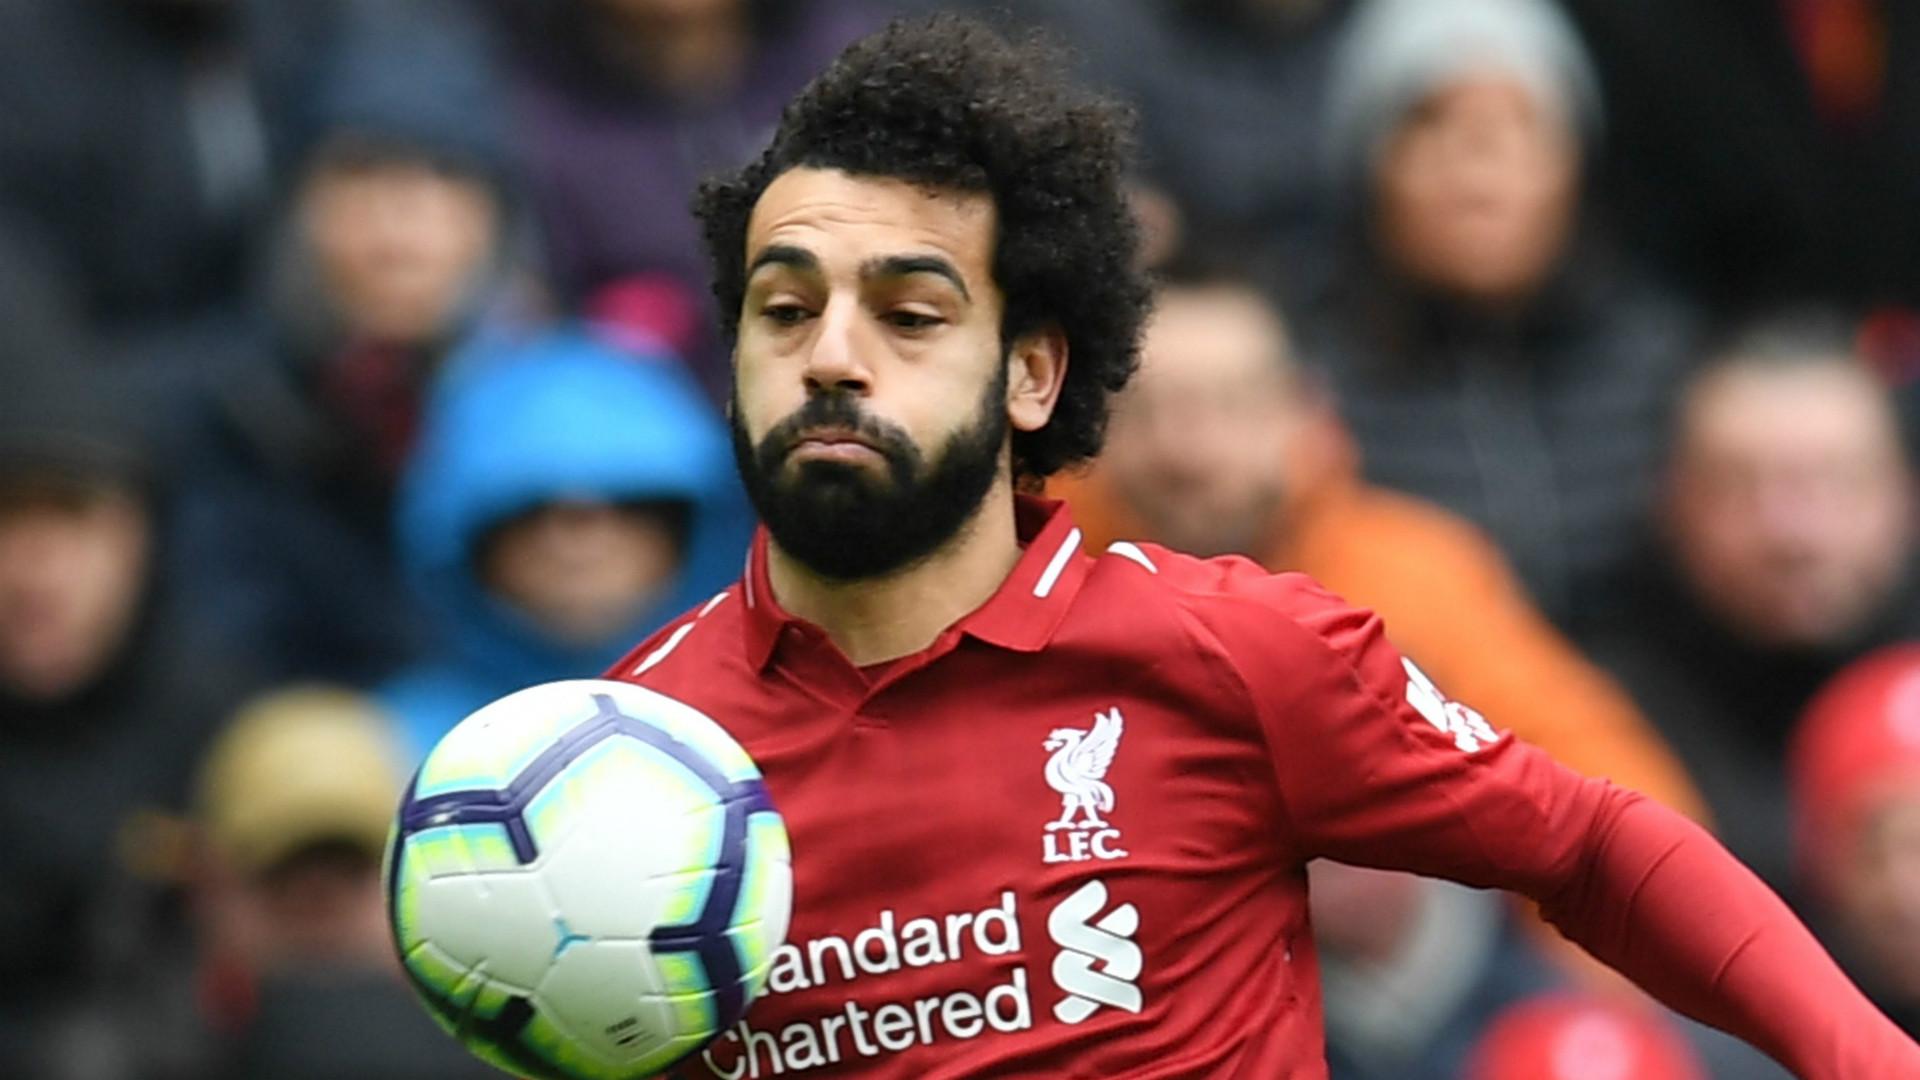 Jamie Carragher delivers blunt verdict on Mo Salah's form at Liverpool FC